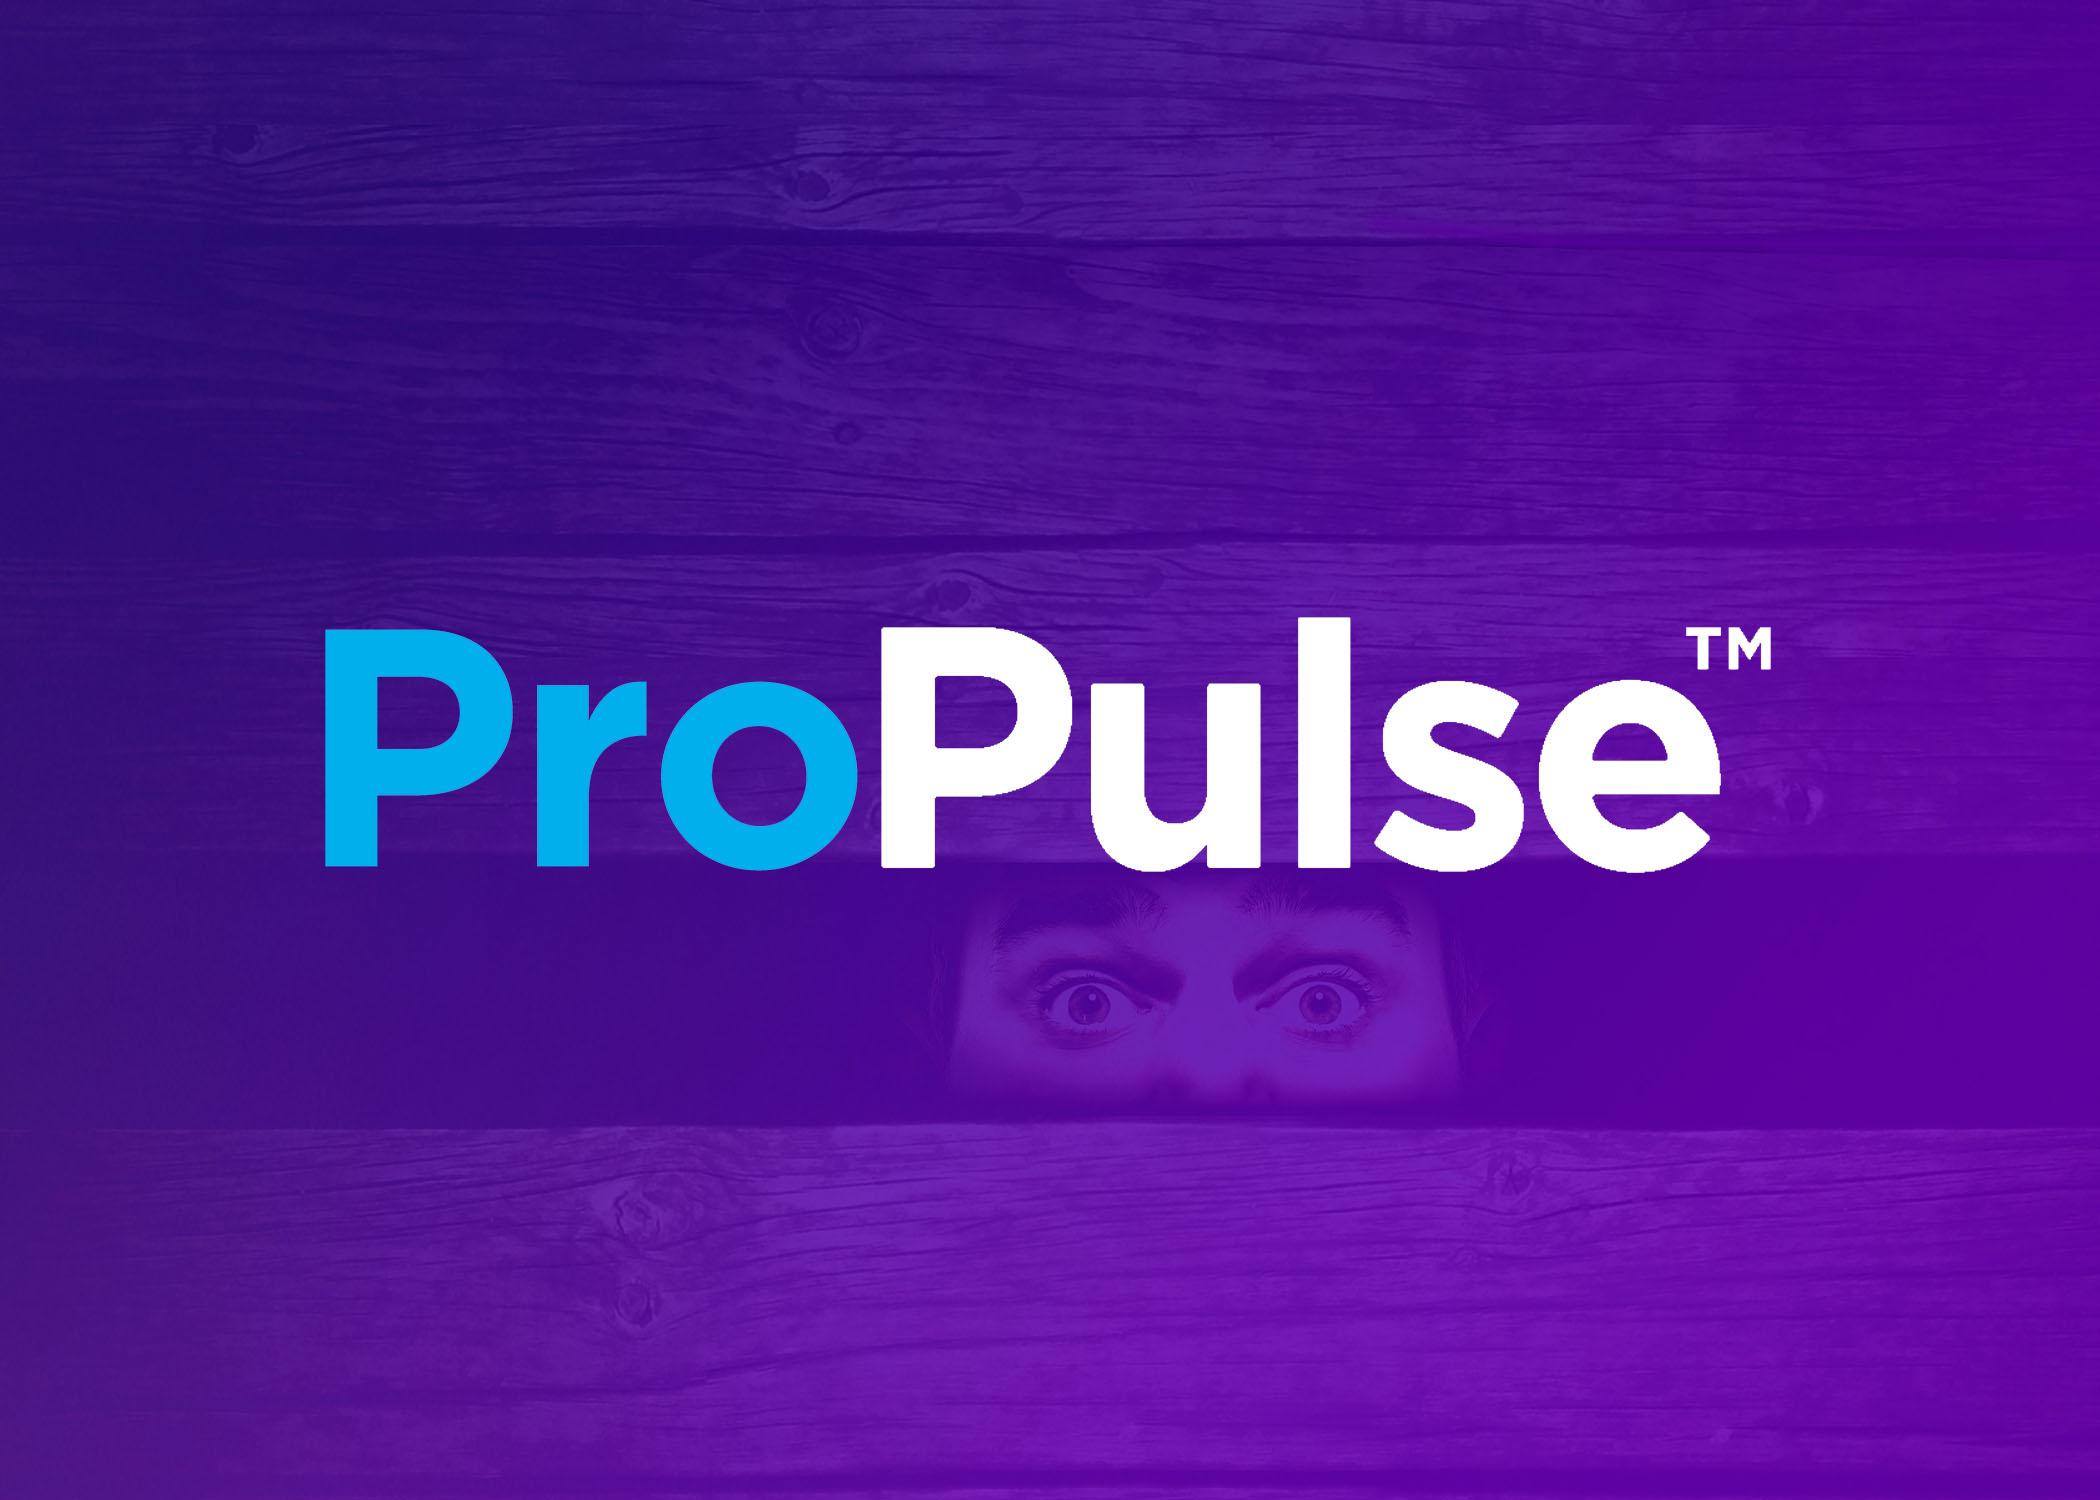 ProPulse Debut Image.jpg